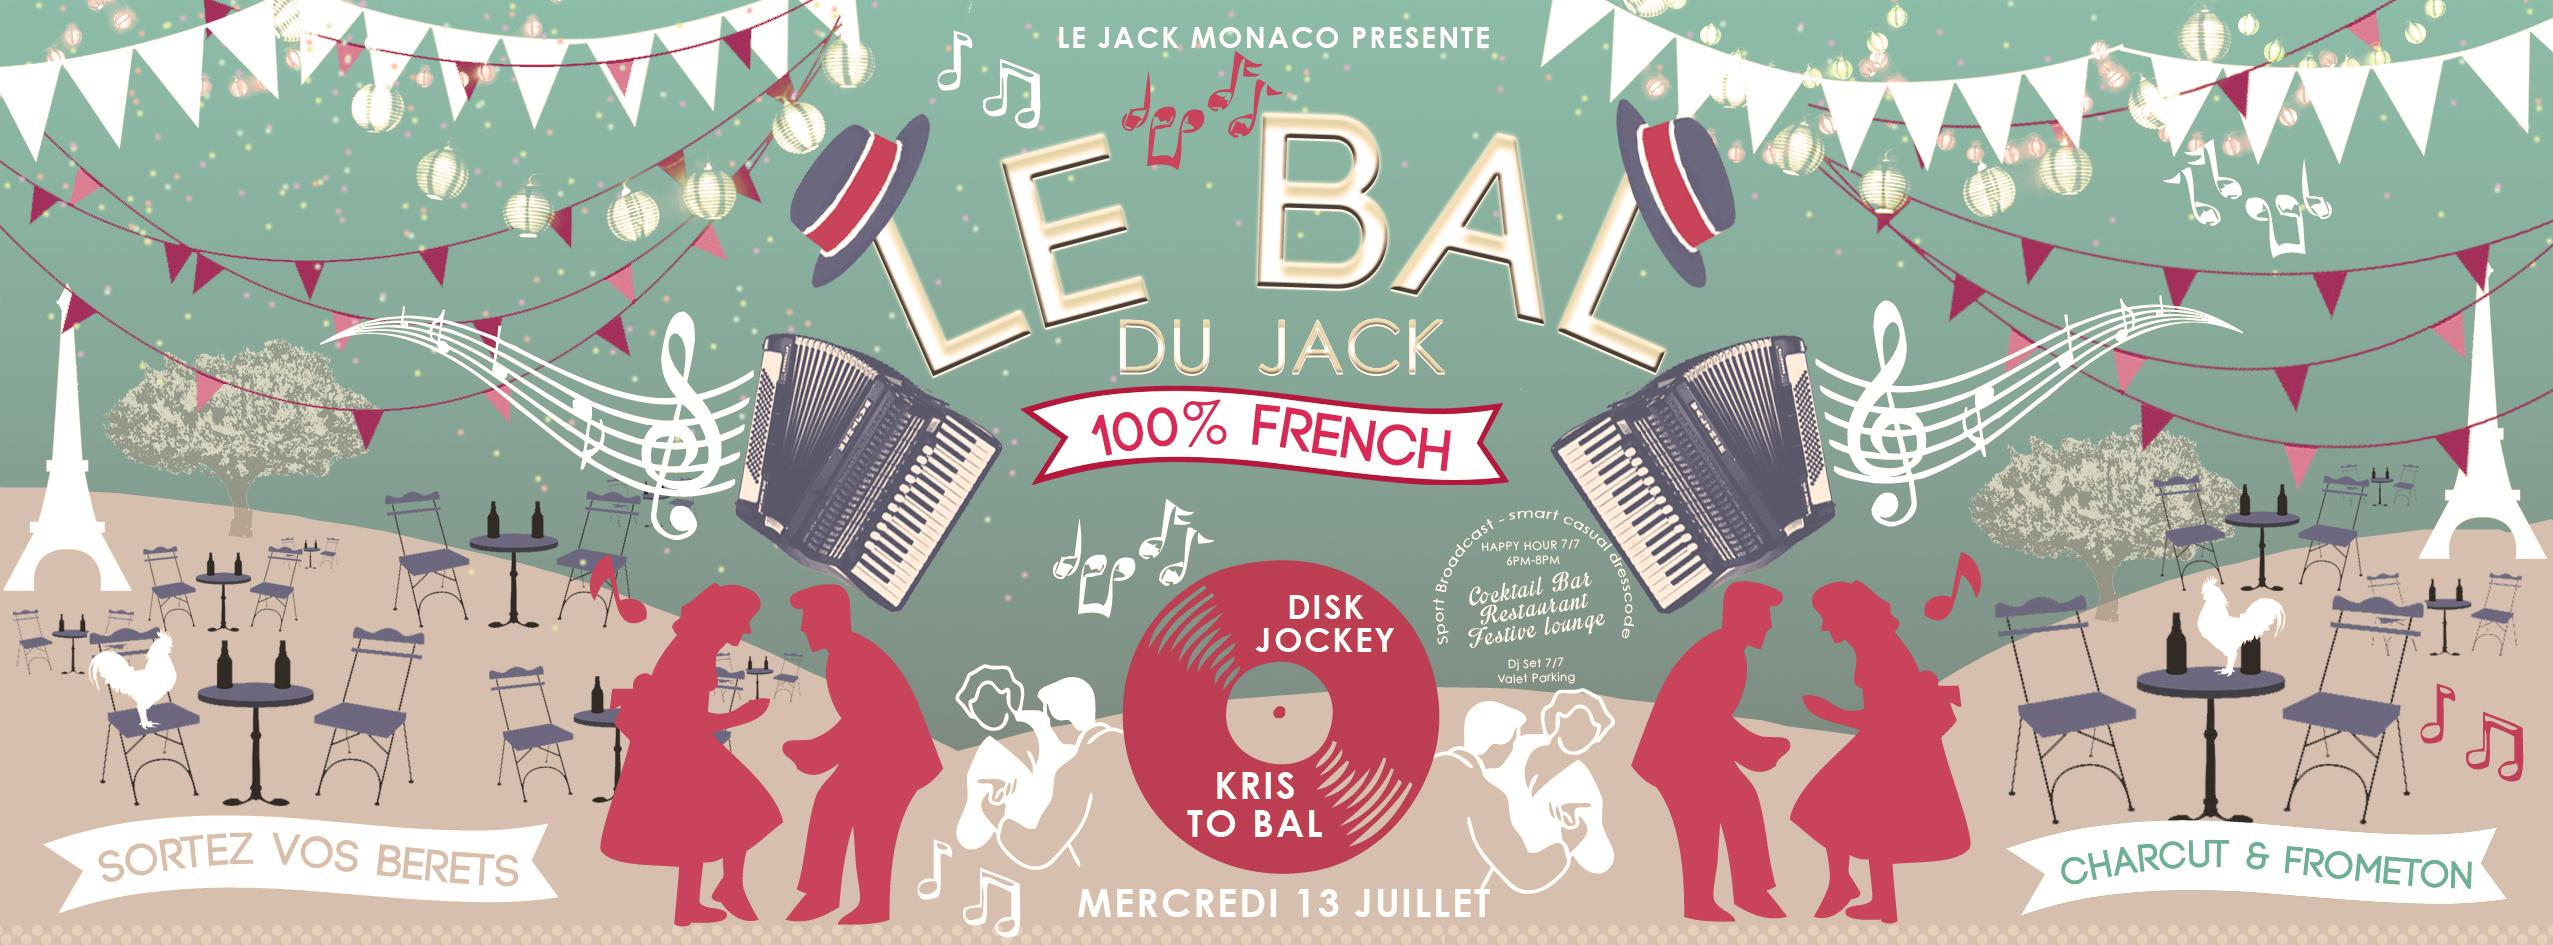 Le-BAL-ok